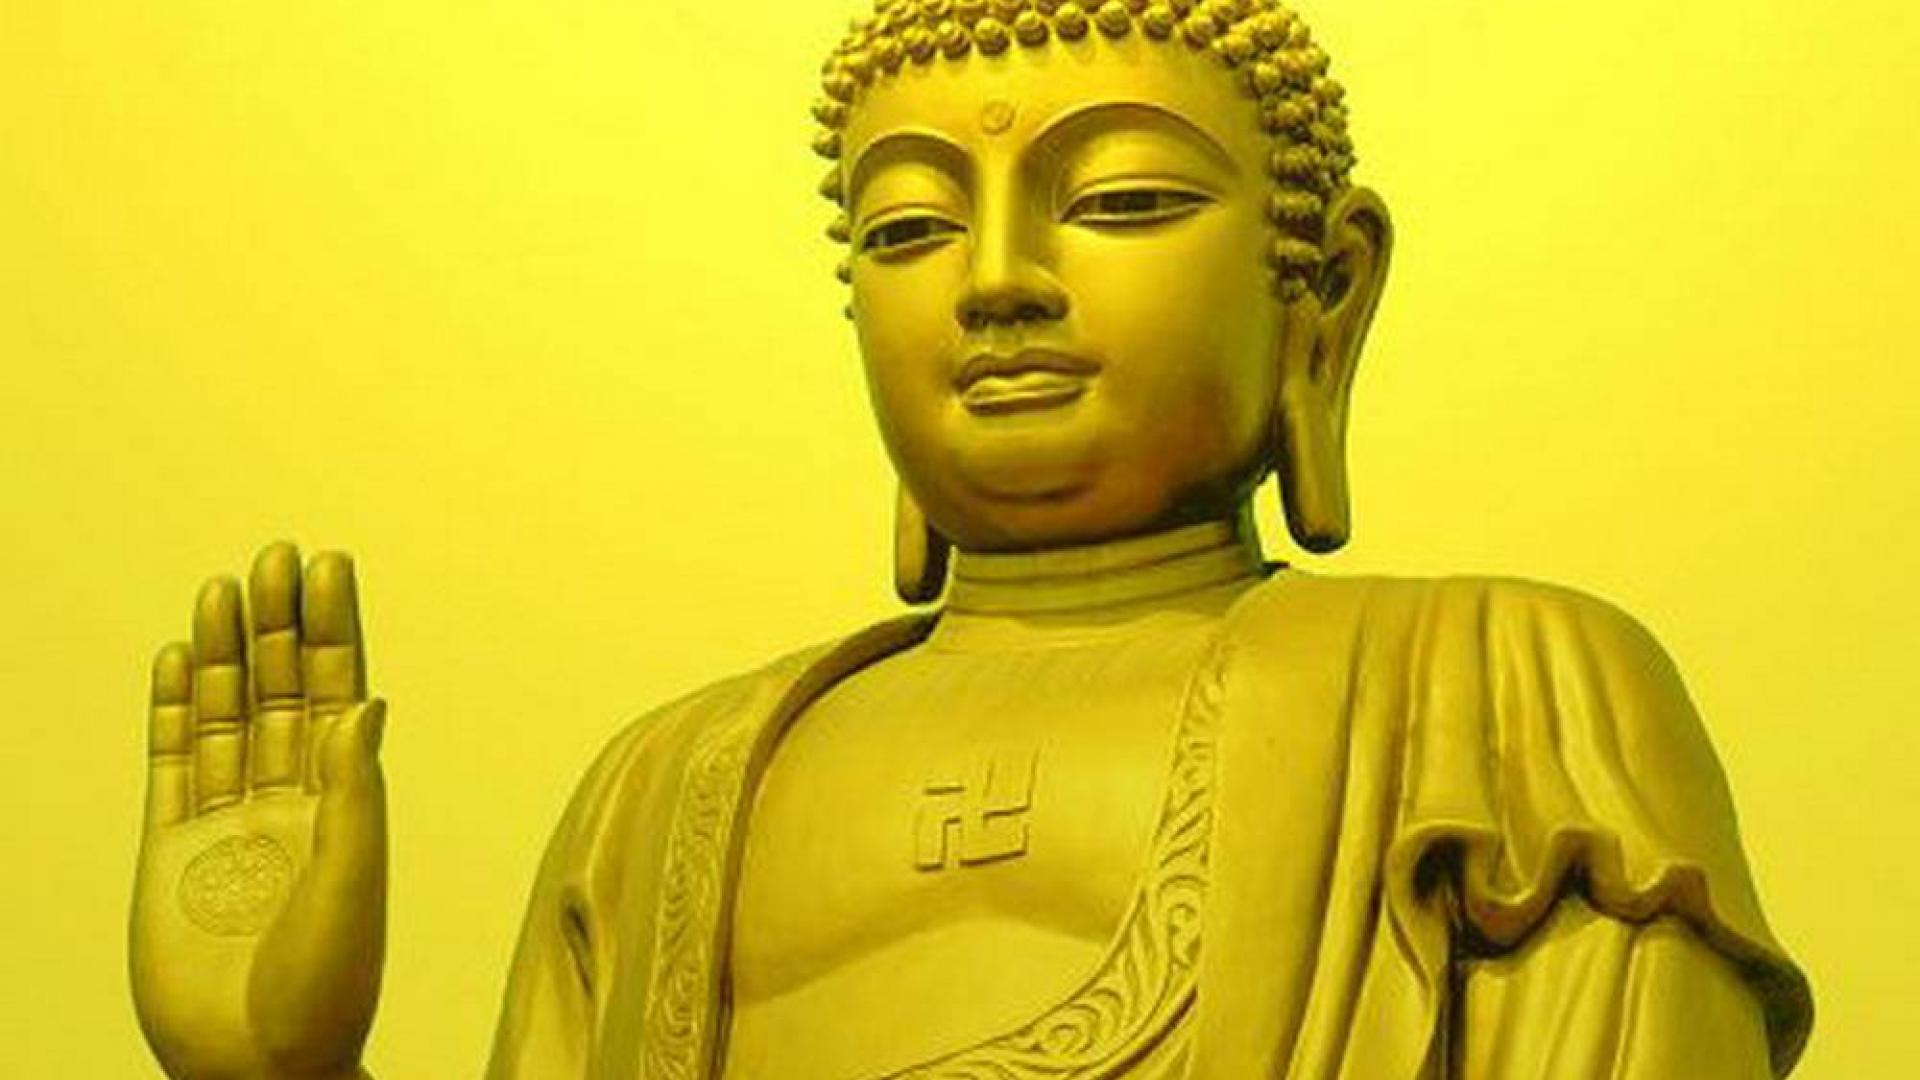 Buddha Wallpapers Wallpaper 1180?882 Wallpapers Of Buddha (42 ...